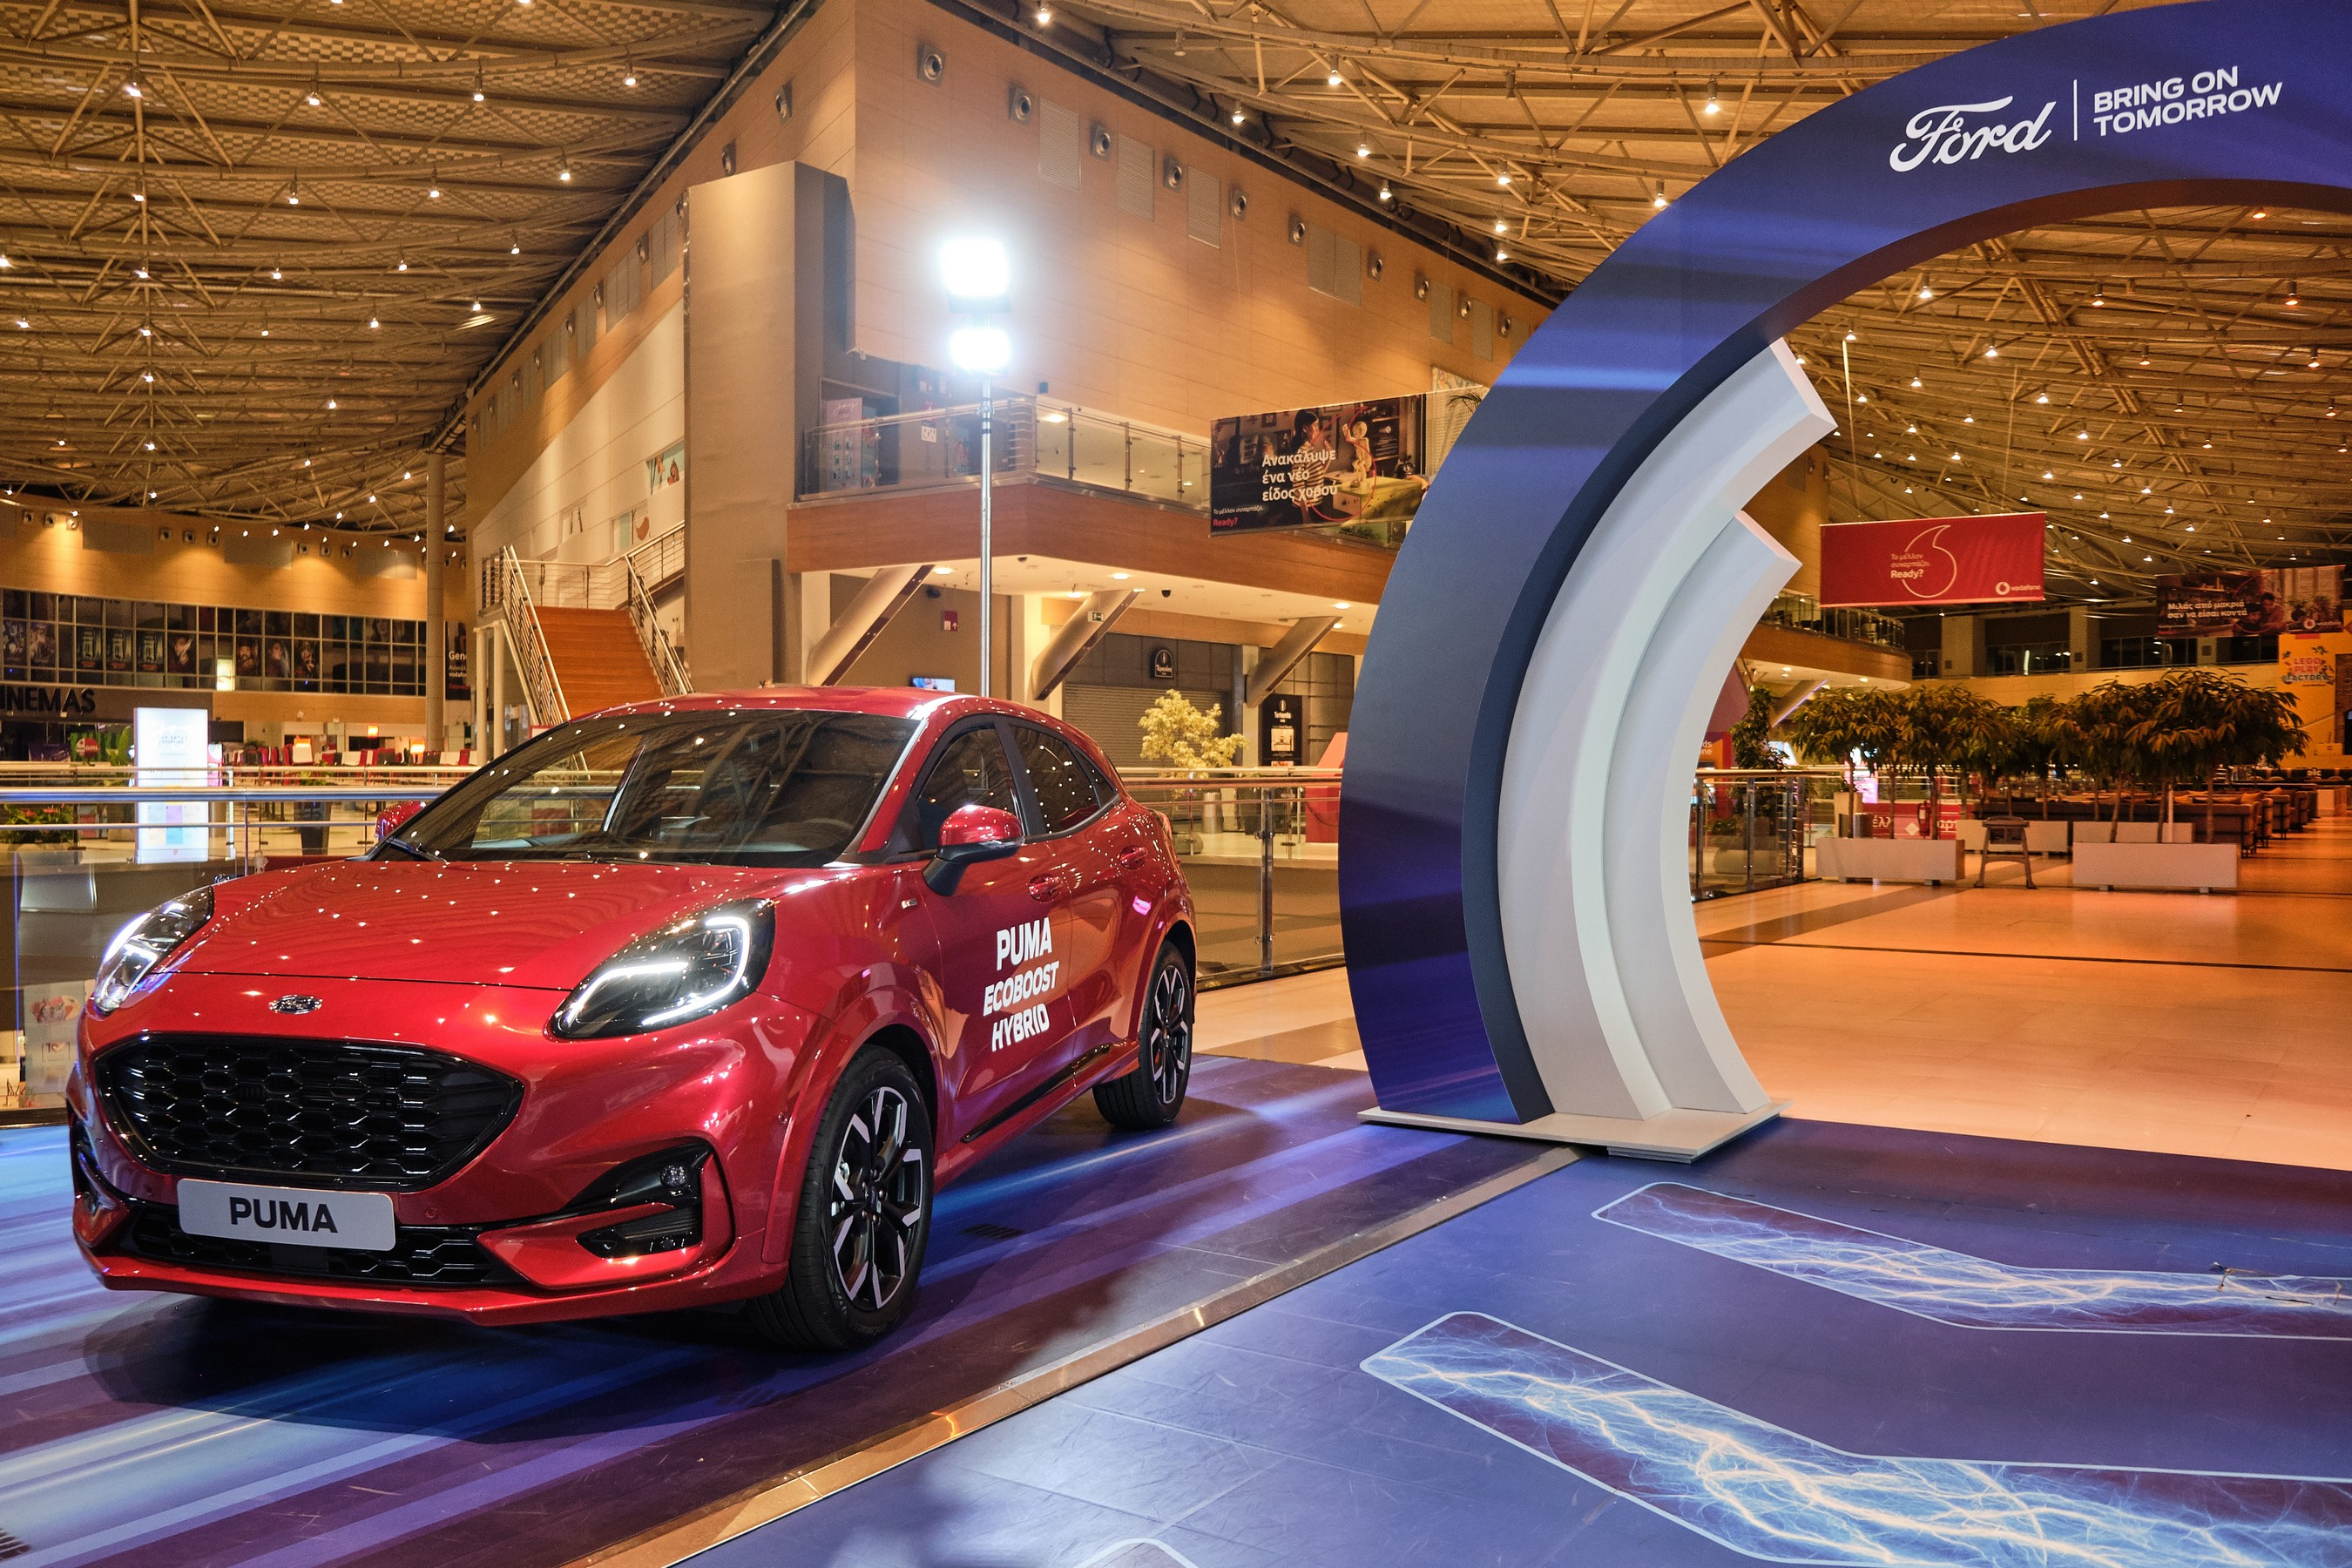 H Ford στην υπερσύγχρονη έκθεσή της στο The Mall Athens